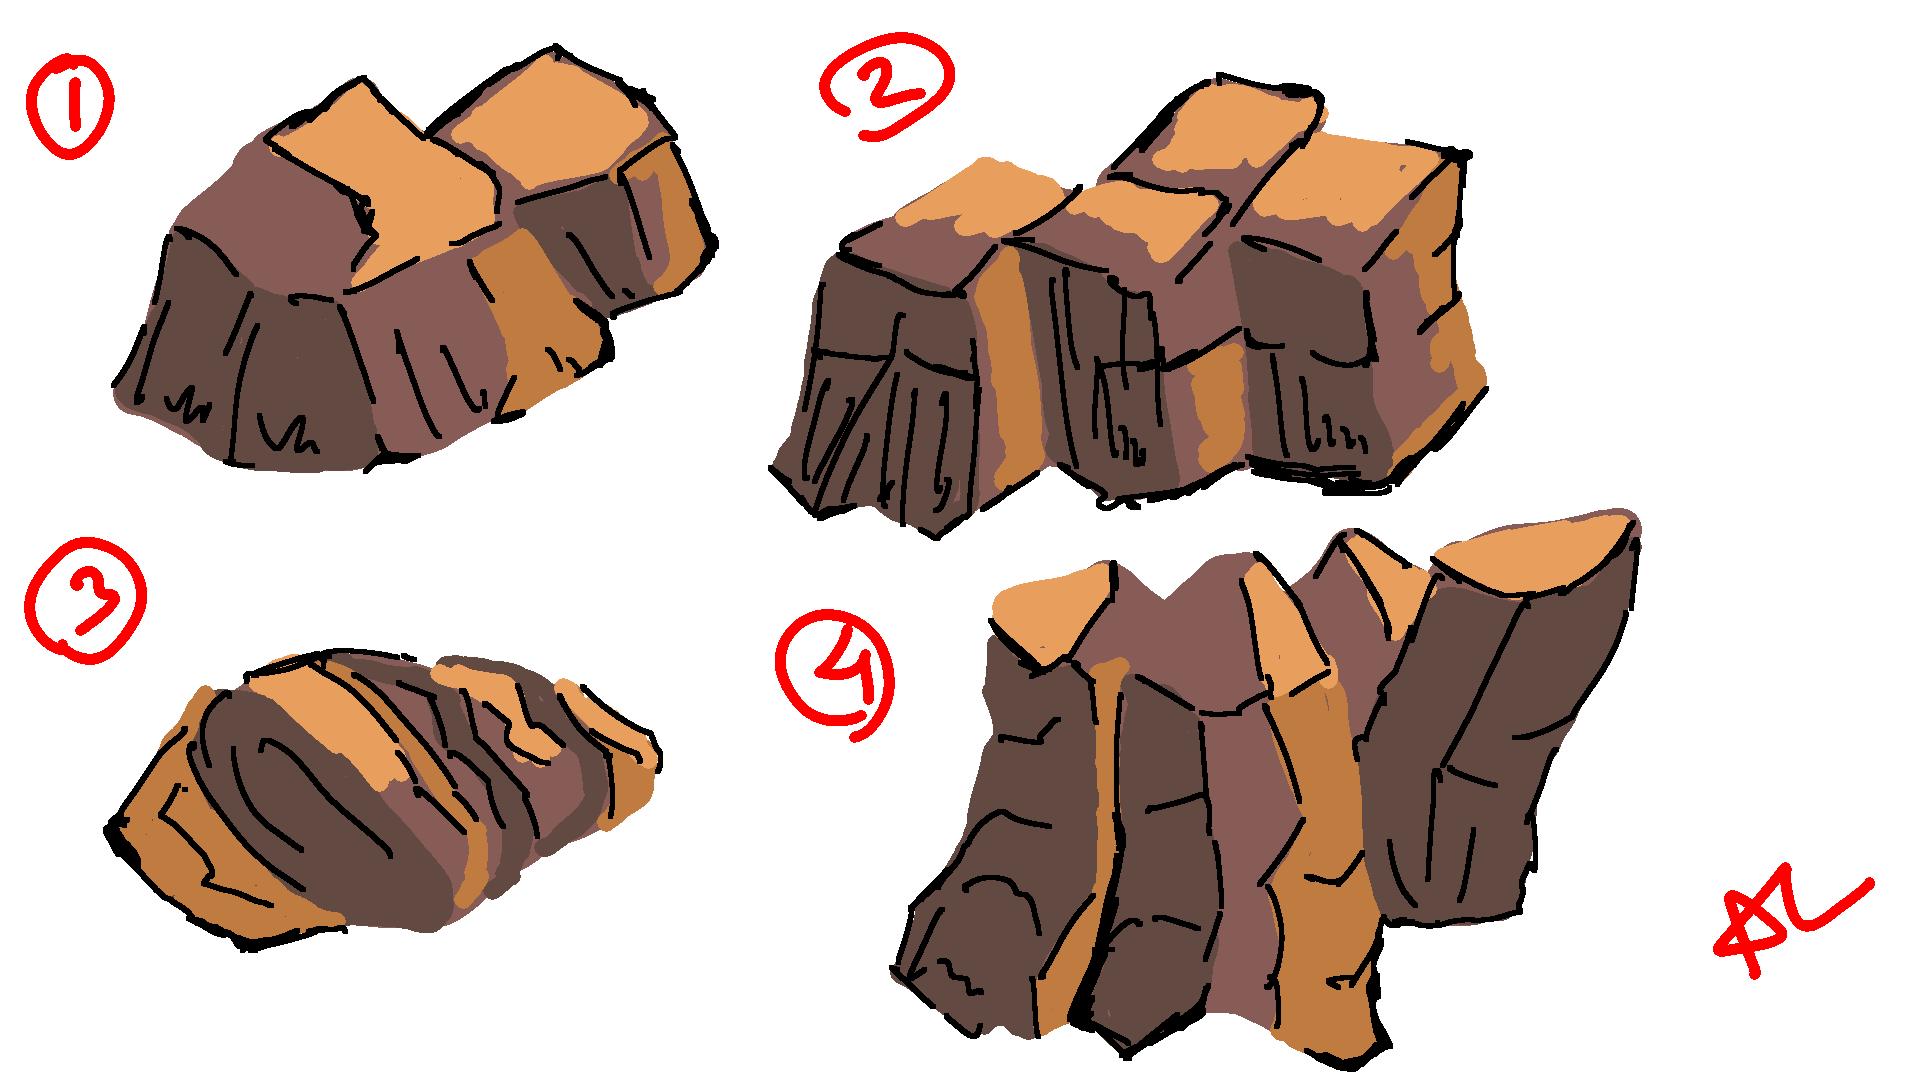 002_RocksFormations.png